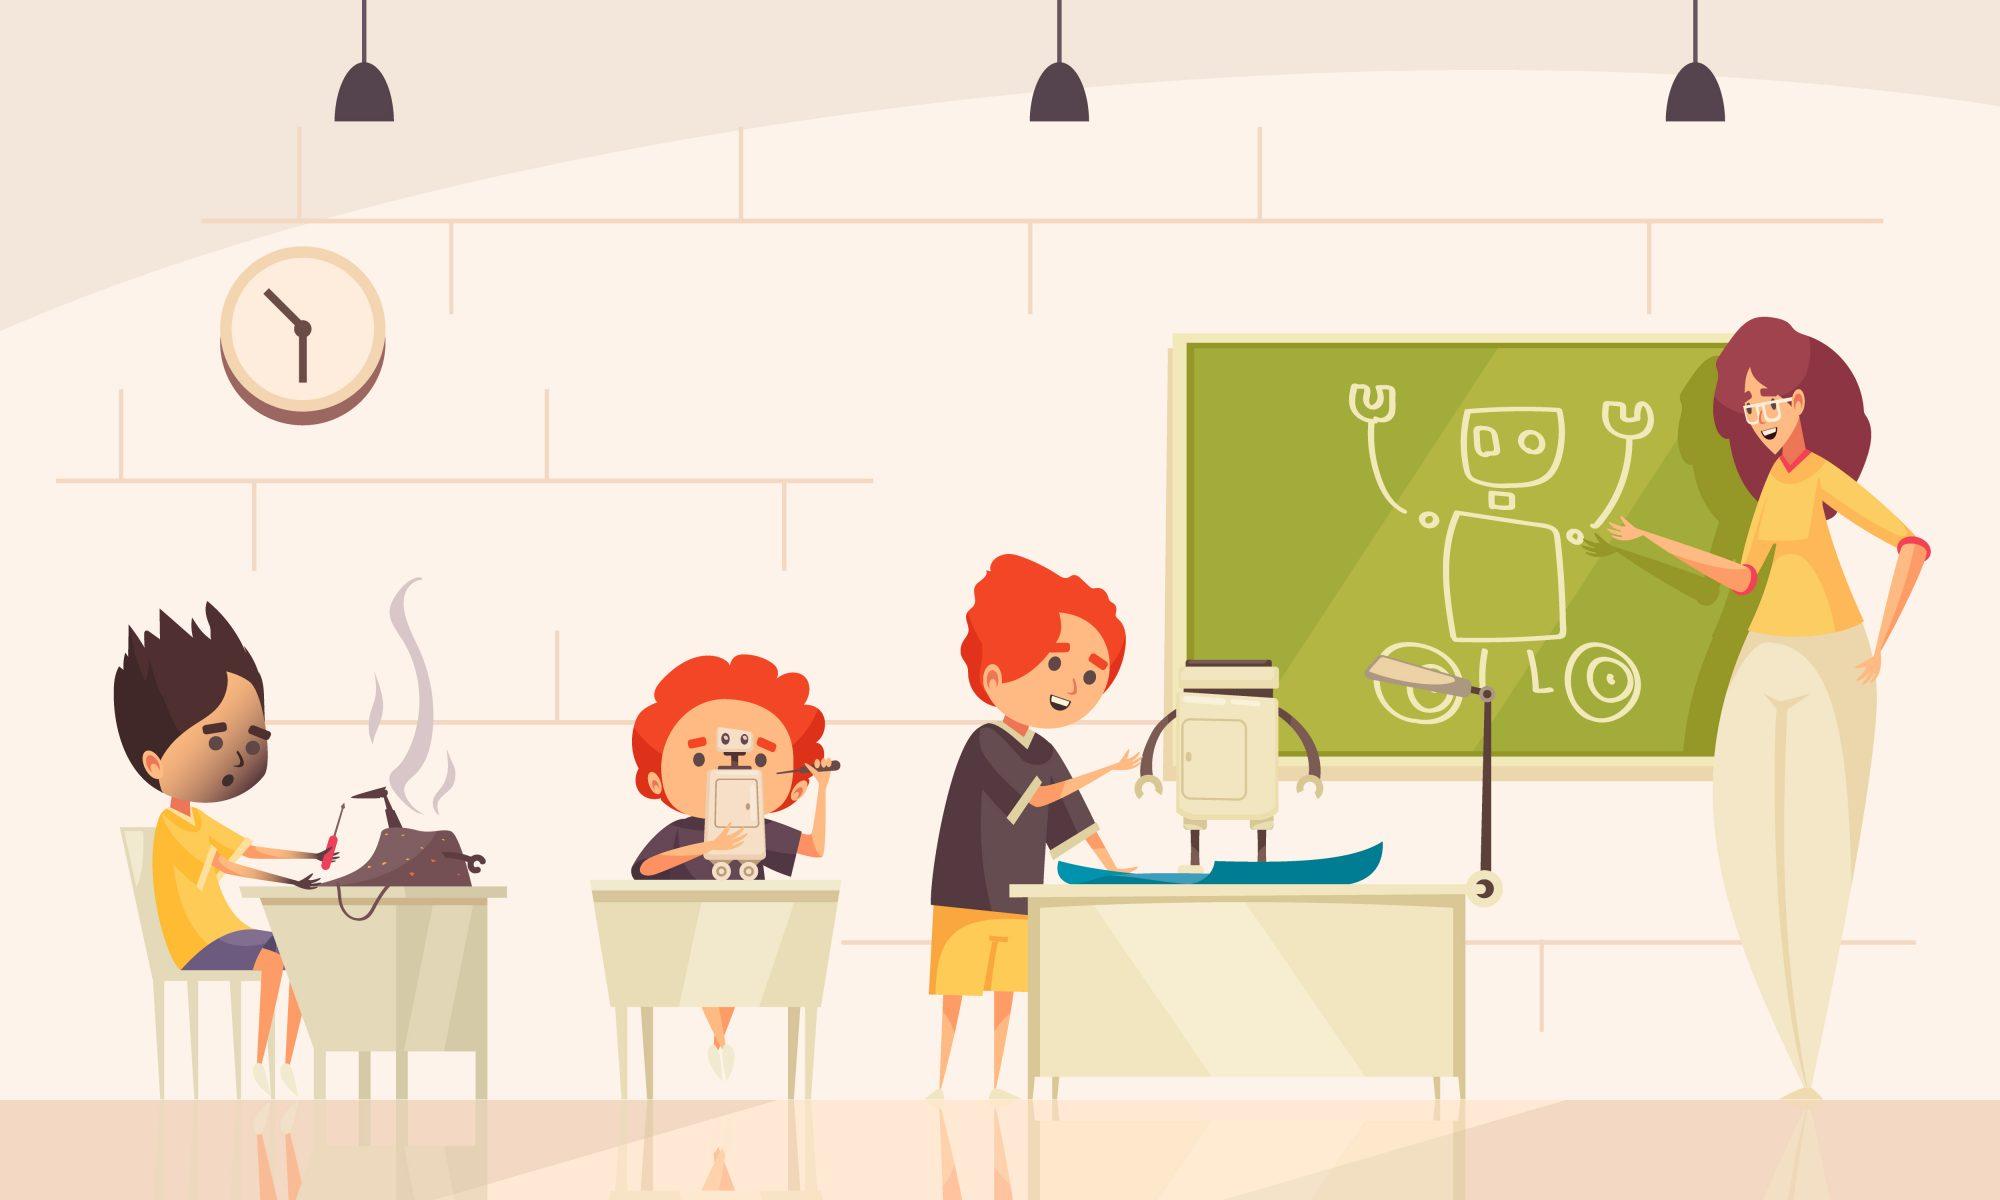 robótica educativa, clases extraescolares